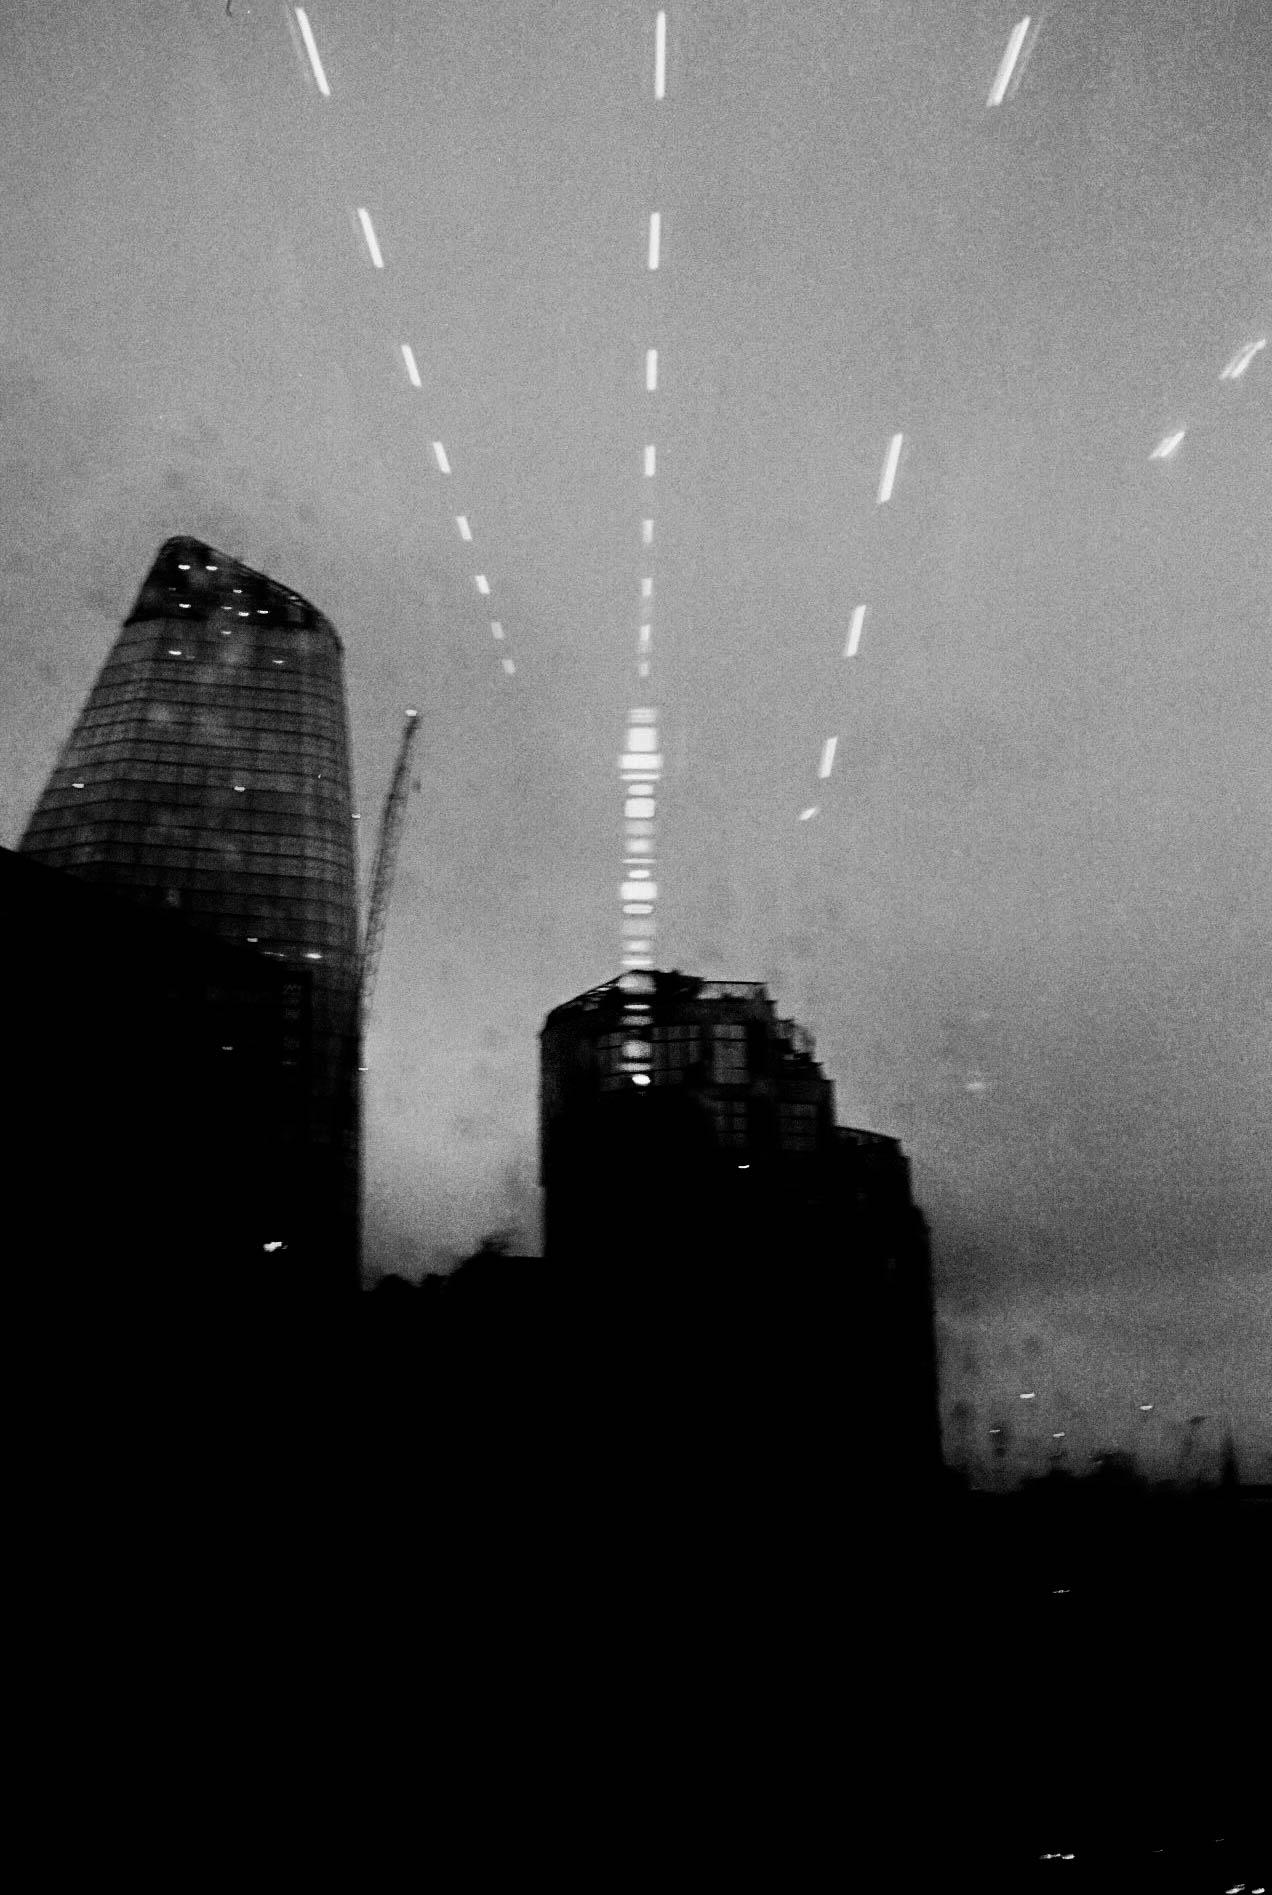 Untitled by joe westley